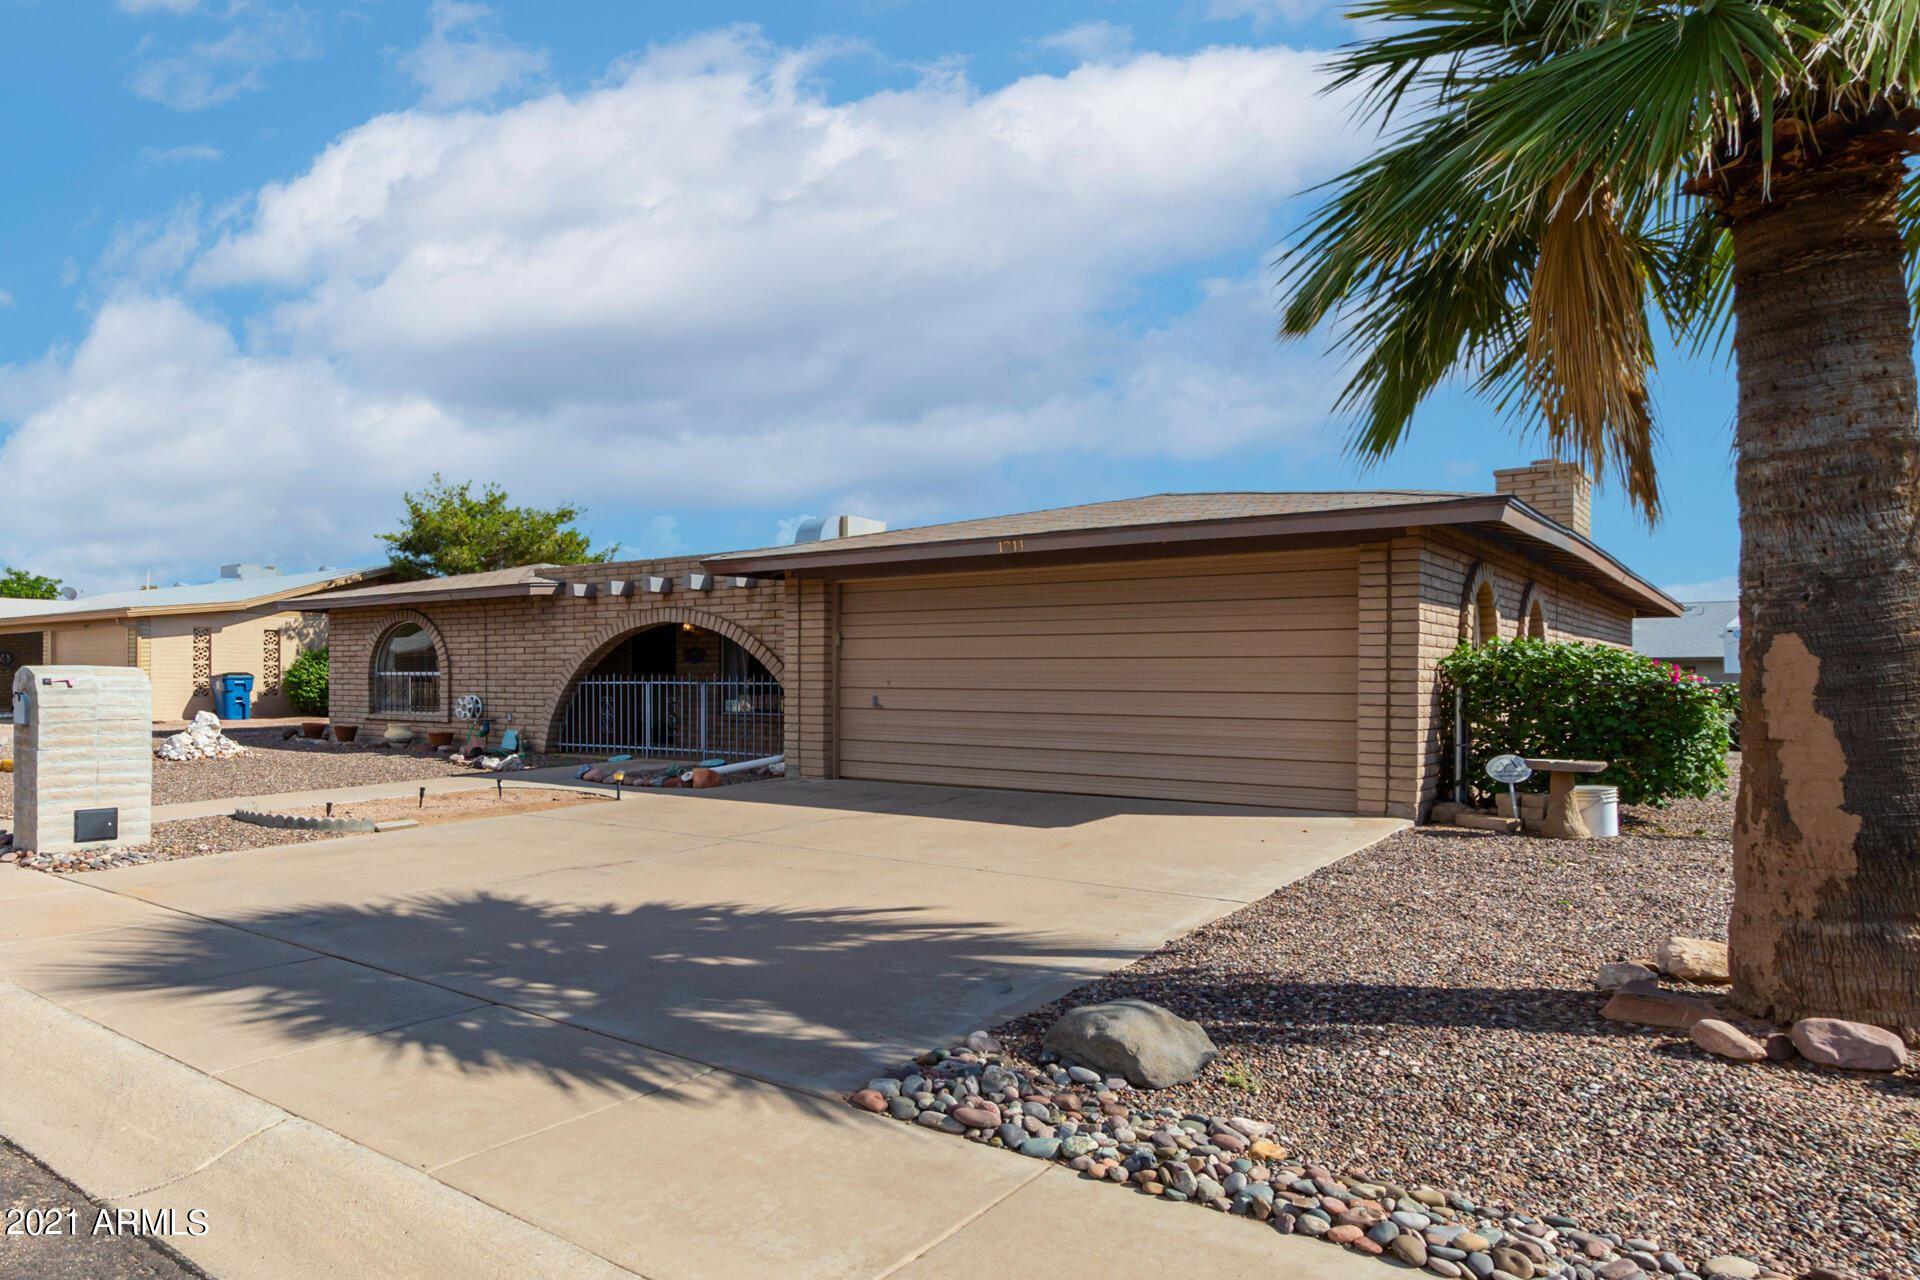 Photo of 1911 W 14TH Avenue, Apache Junction, AZ 85120 (MLS # 6287144)